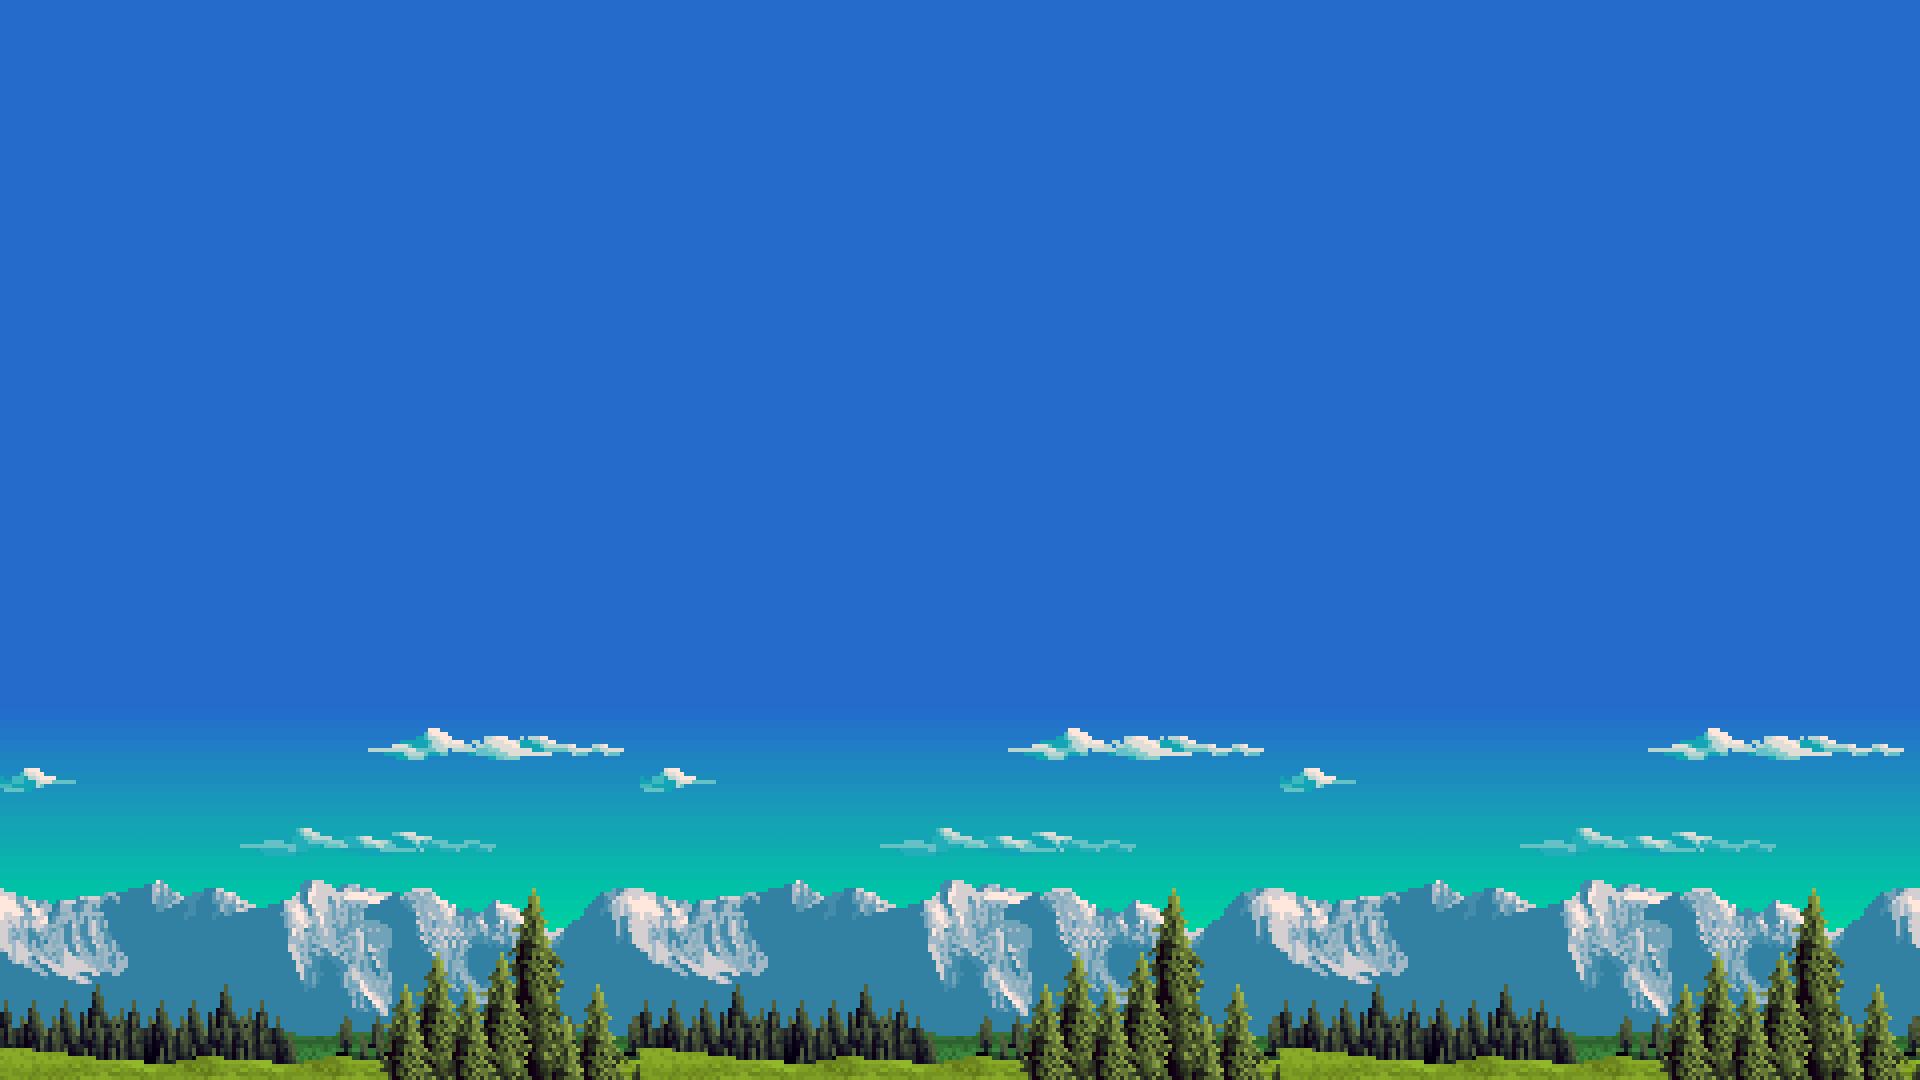 Pixel Art Landscapes Pixel Art Landscape Pixel Art Water Illustration